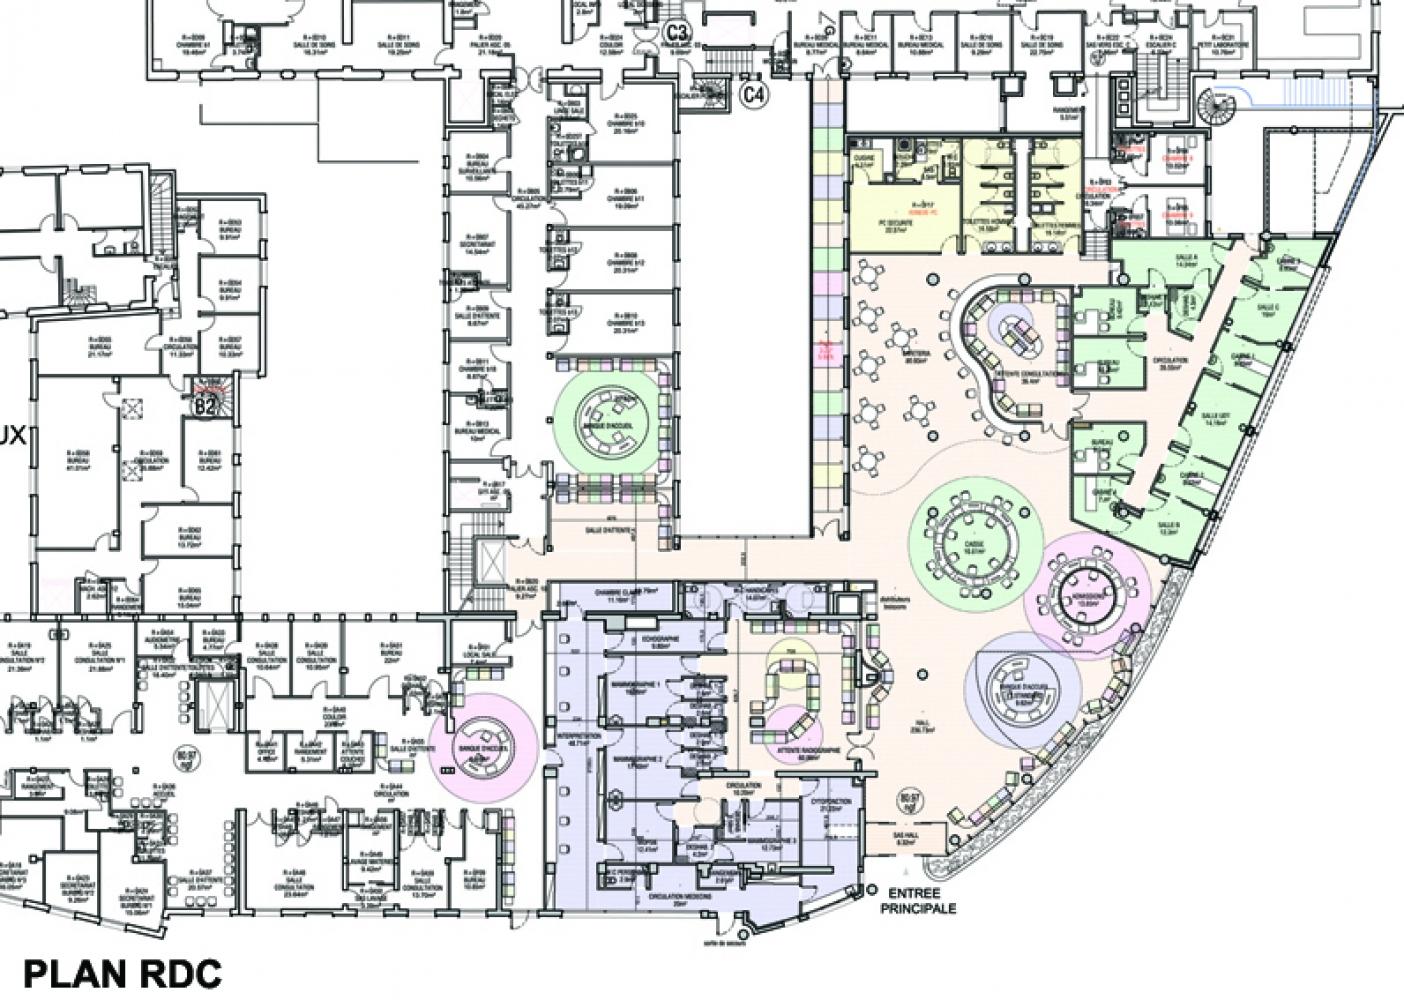 zhugx---03 Pascale SEURIN Architecte - Hospitalier